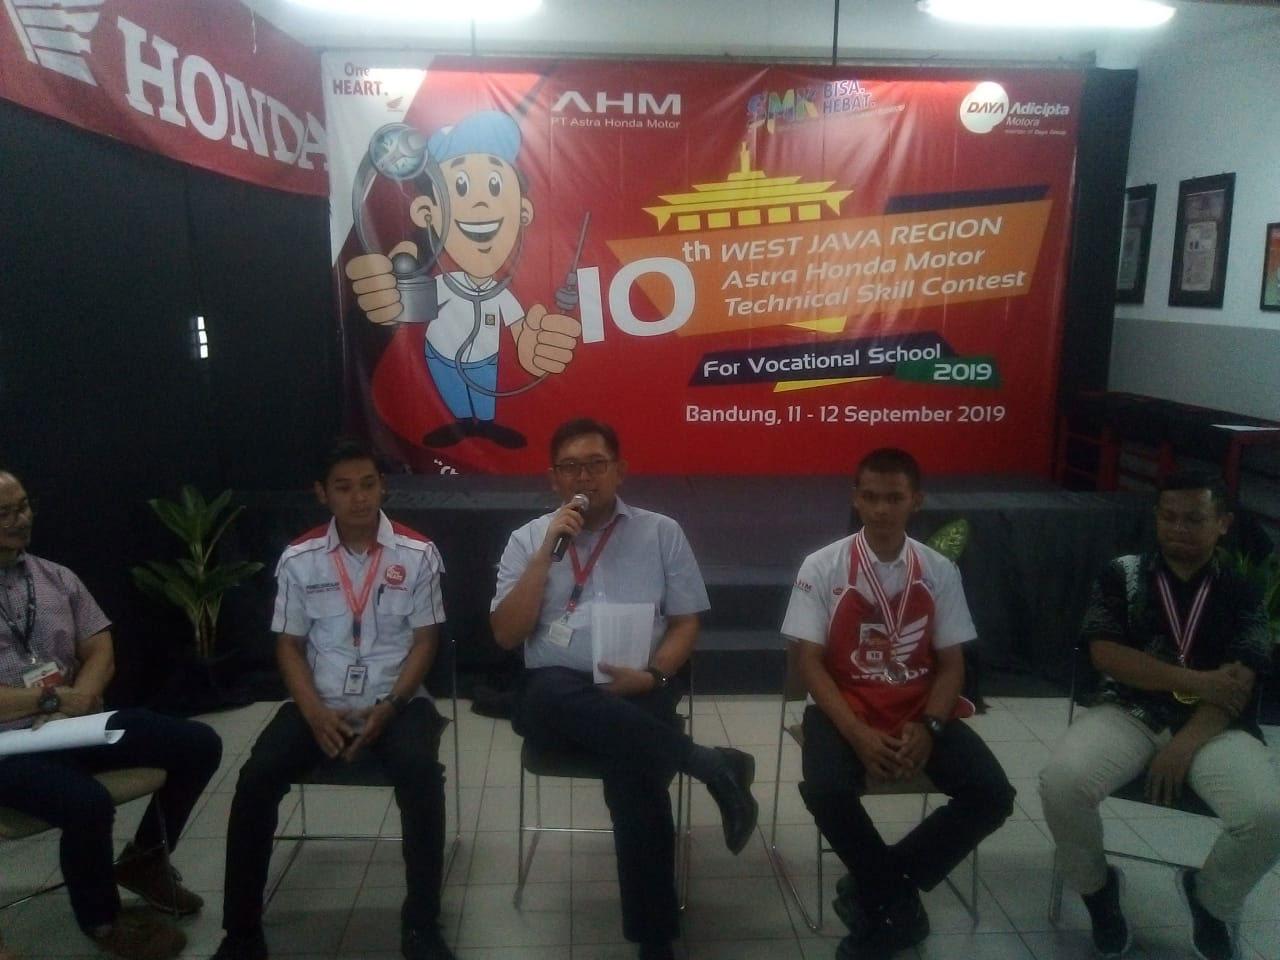 Ajang-Astra-Honda-Motor-Technical-Skill-Contest